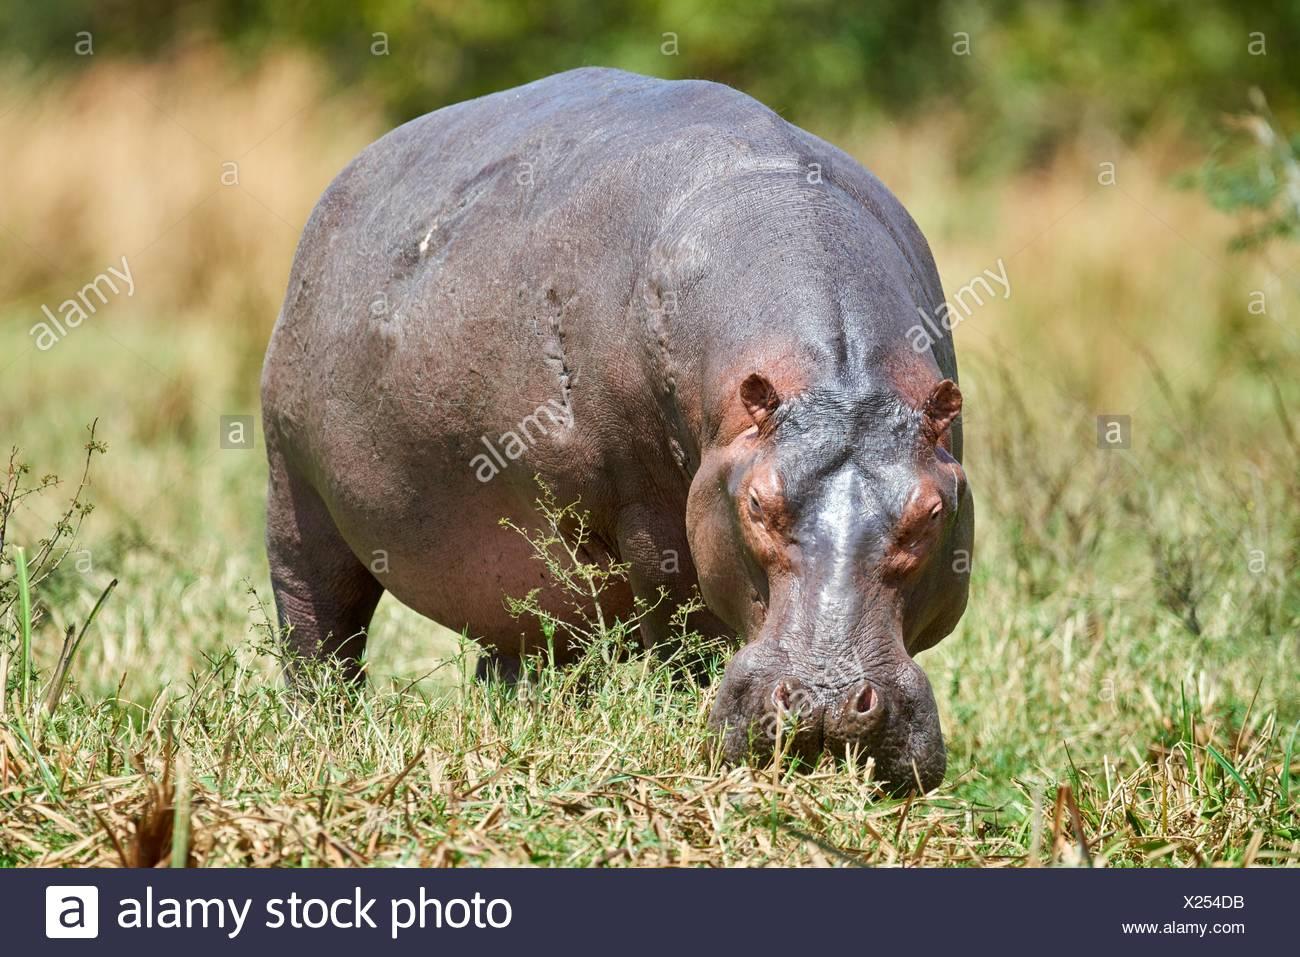 Pastoreo de hipopótamo (Hippopotamus amphibius) Murchisson Falls, Parque Nacional de Uganda. Imagen De Stock